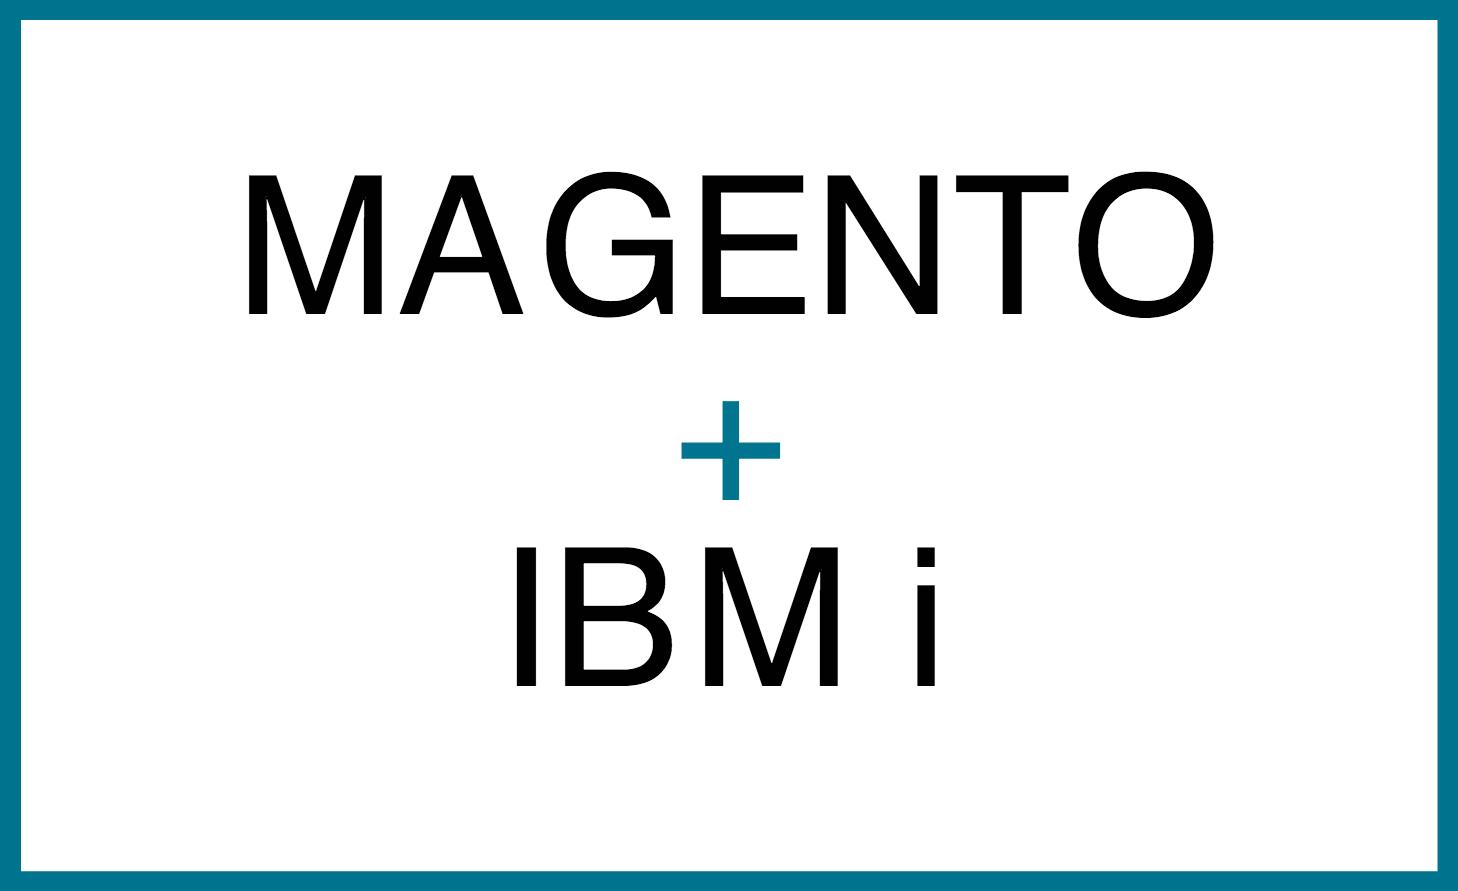 integrating magento and ibm i.png